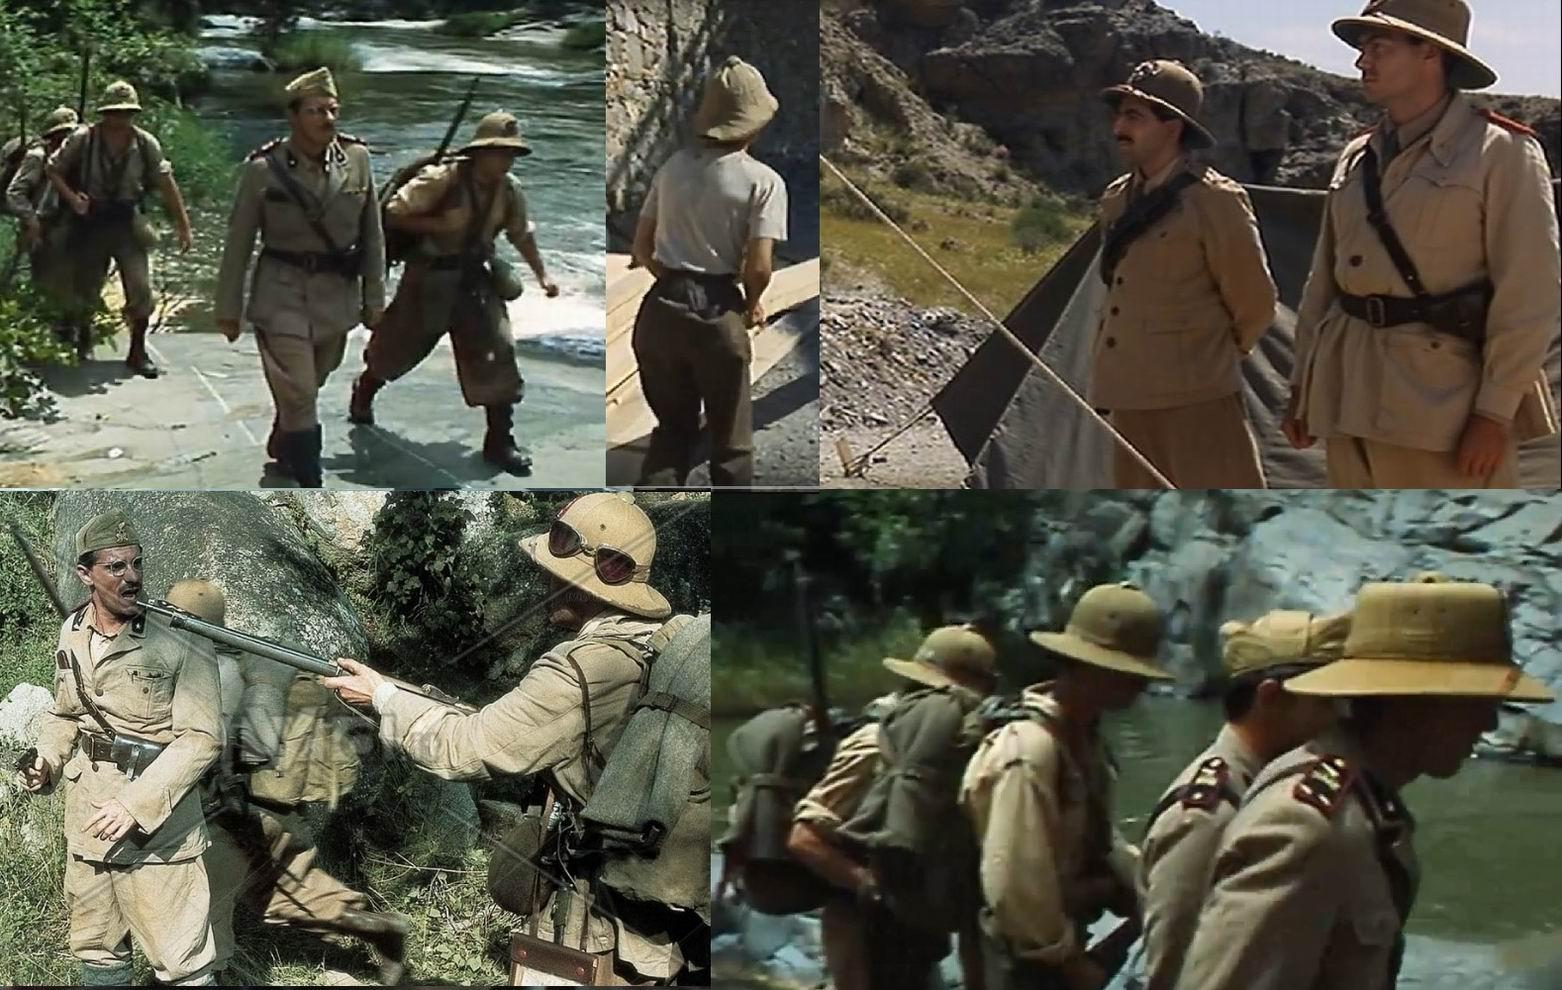 Хорошо видна разница между солдатскими и офицерским тропическими шлемами.